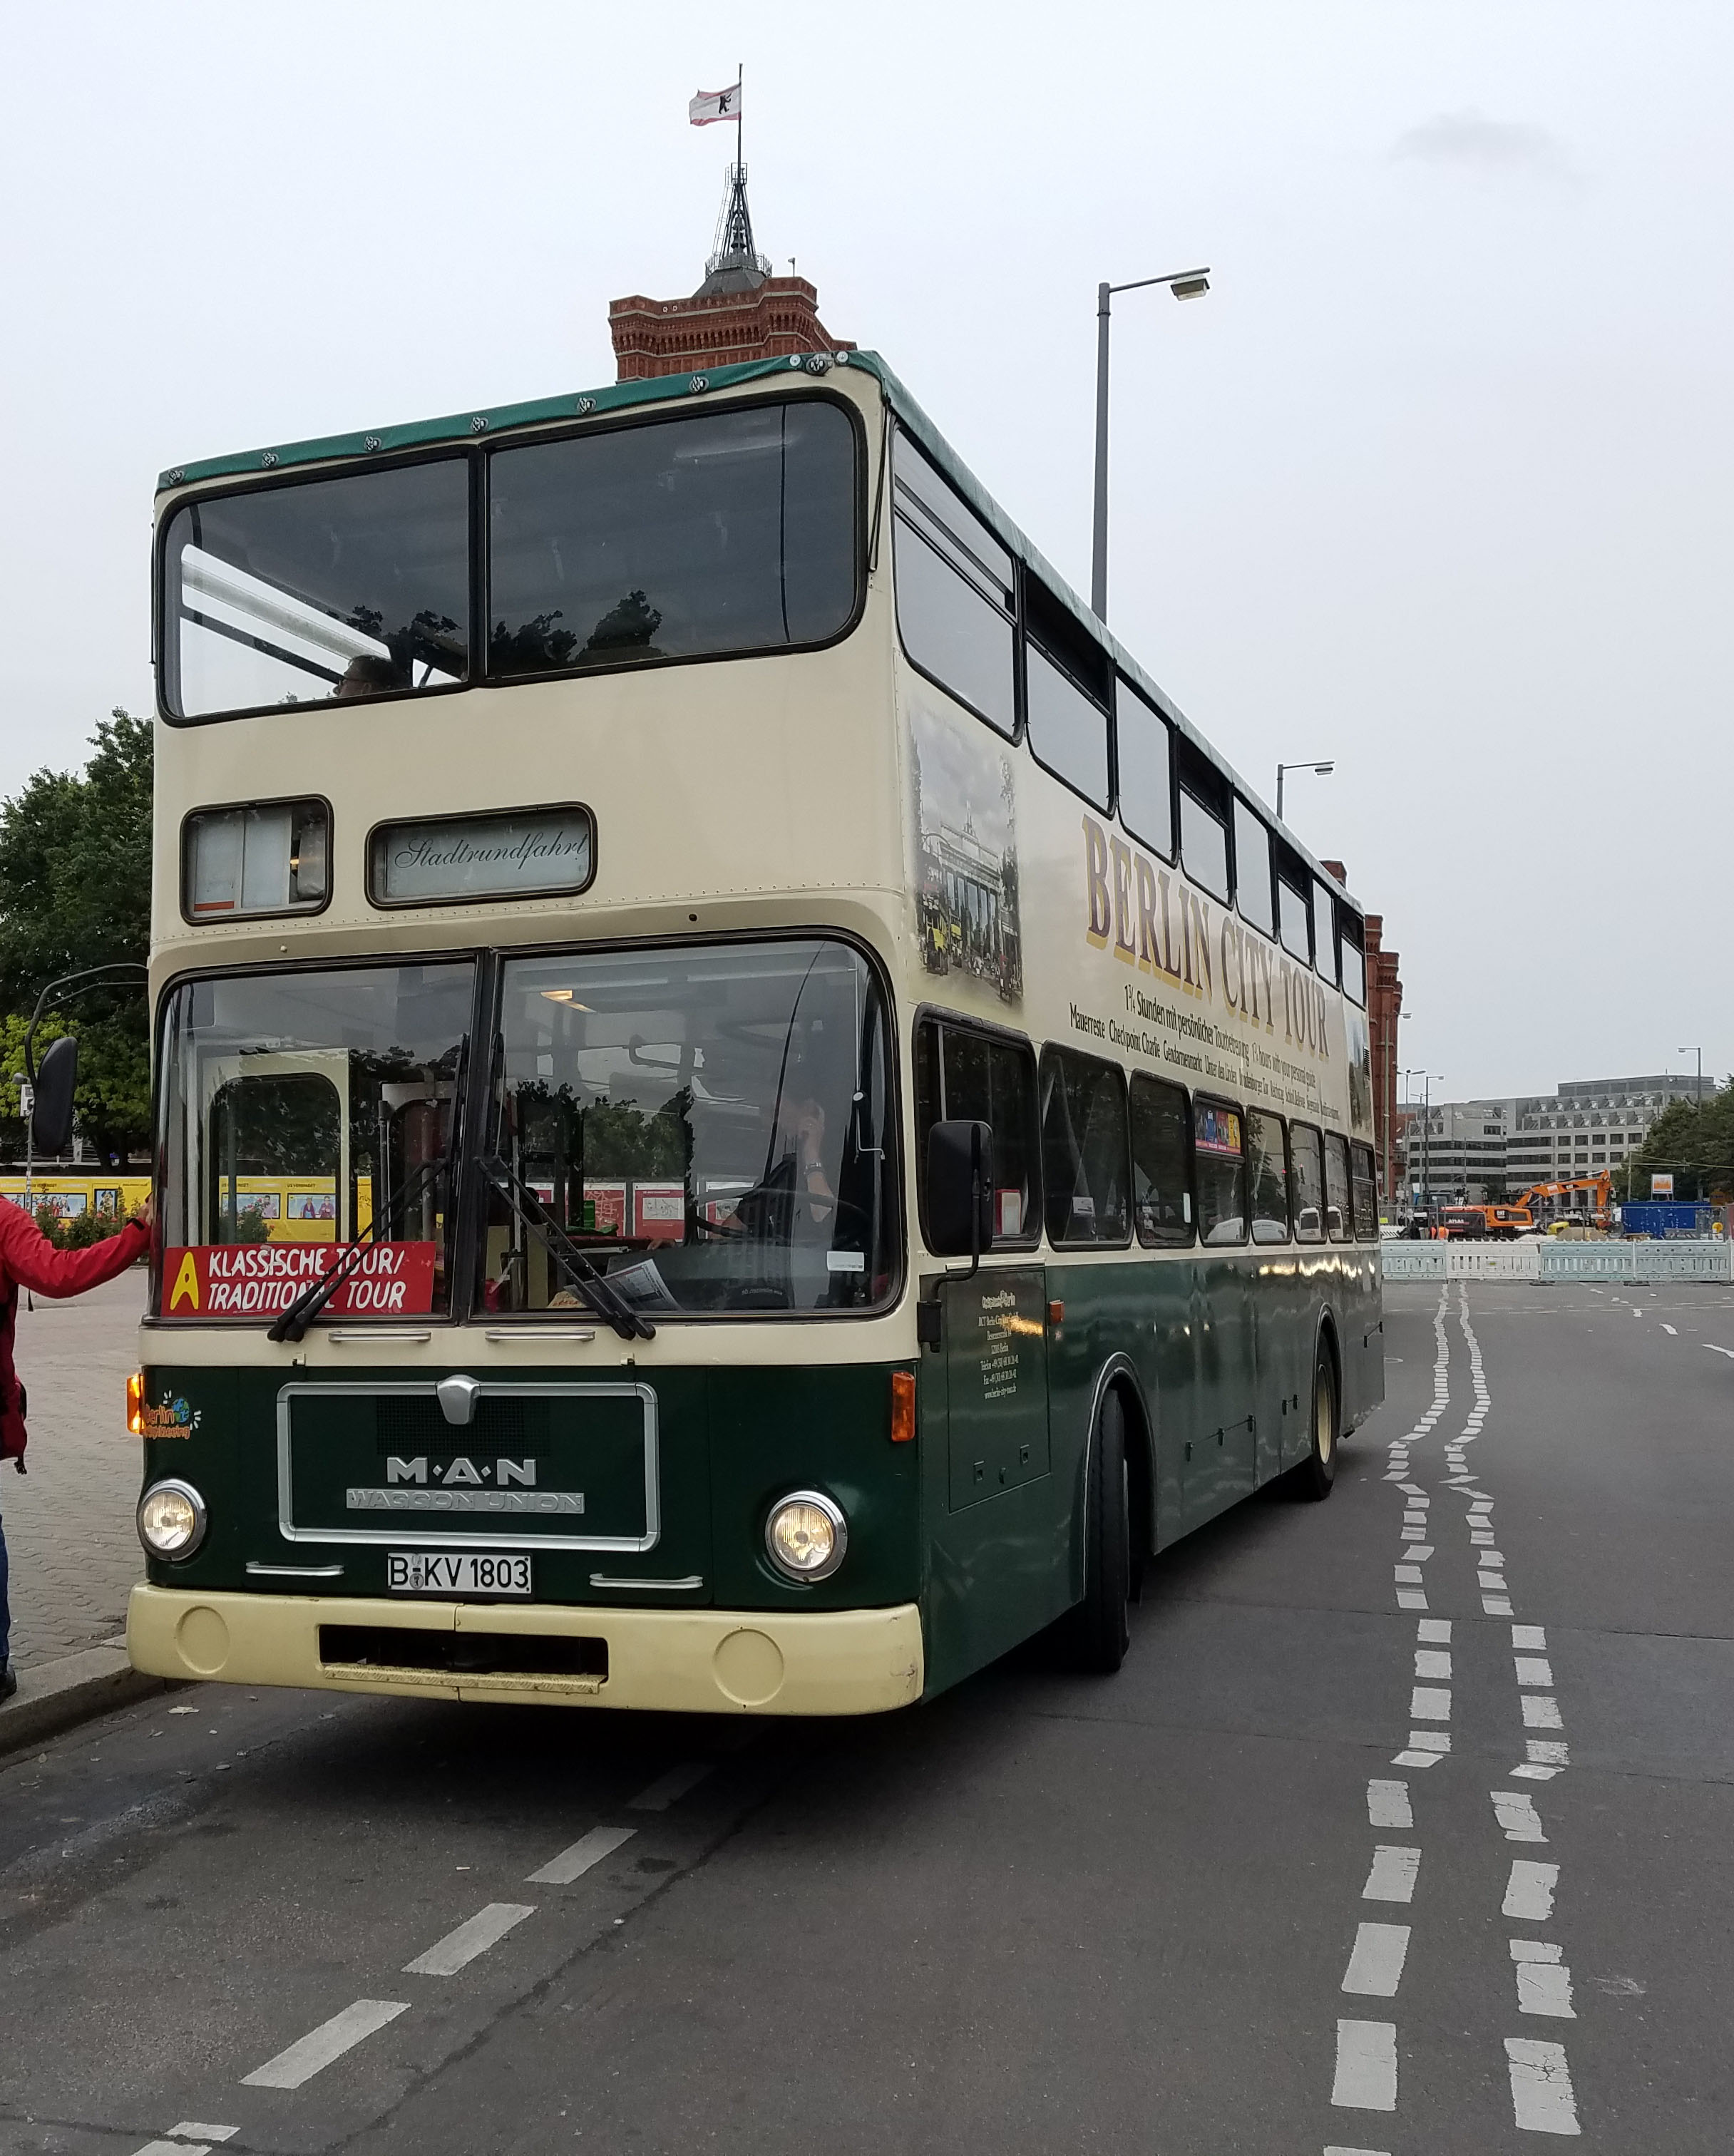 Foto: Bus 1803, Typ SD81, Stadtrundfahrtbus B KV 1803, Berlin, September 2017